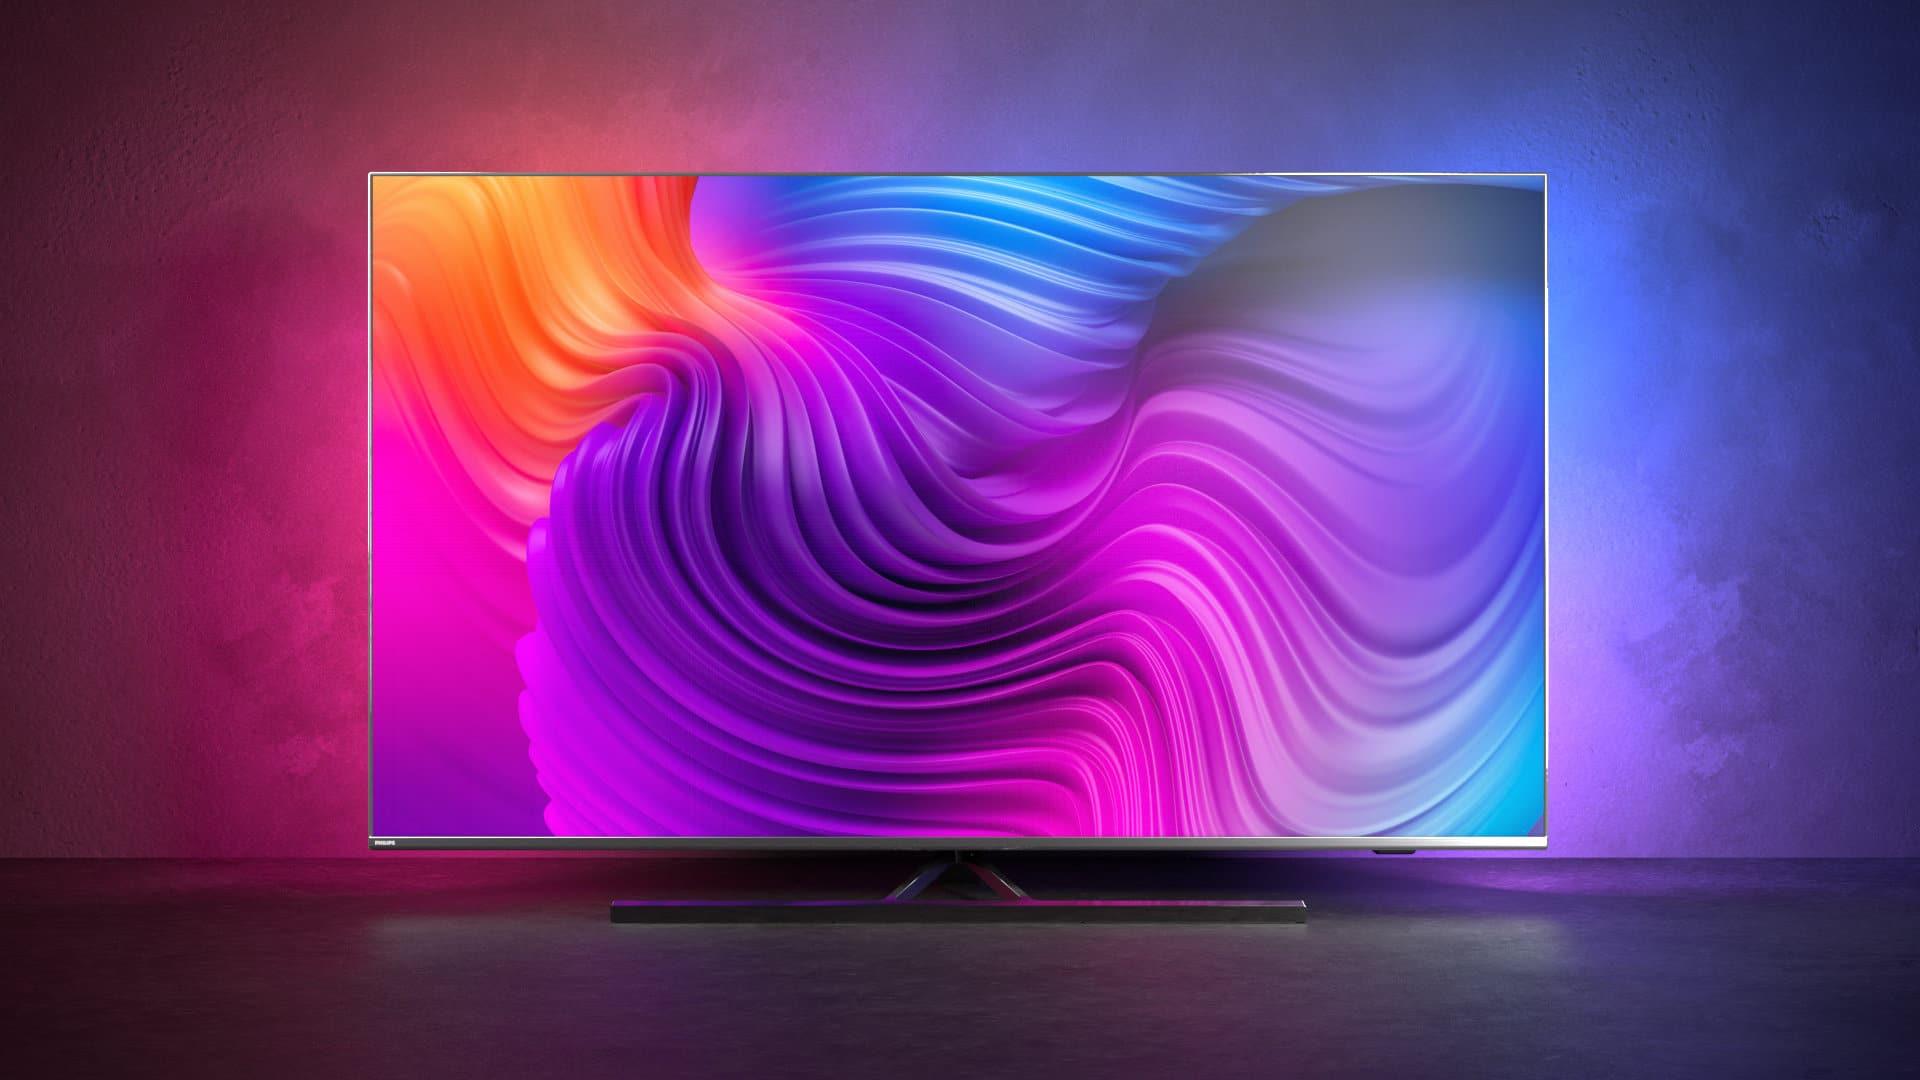 Philips-Mimi-Sound-Personalization-bietet-individuelle-Klangprofile-f-r-aktuelle-TVs